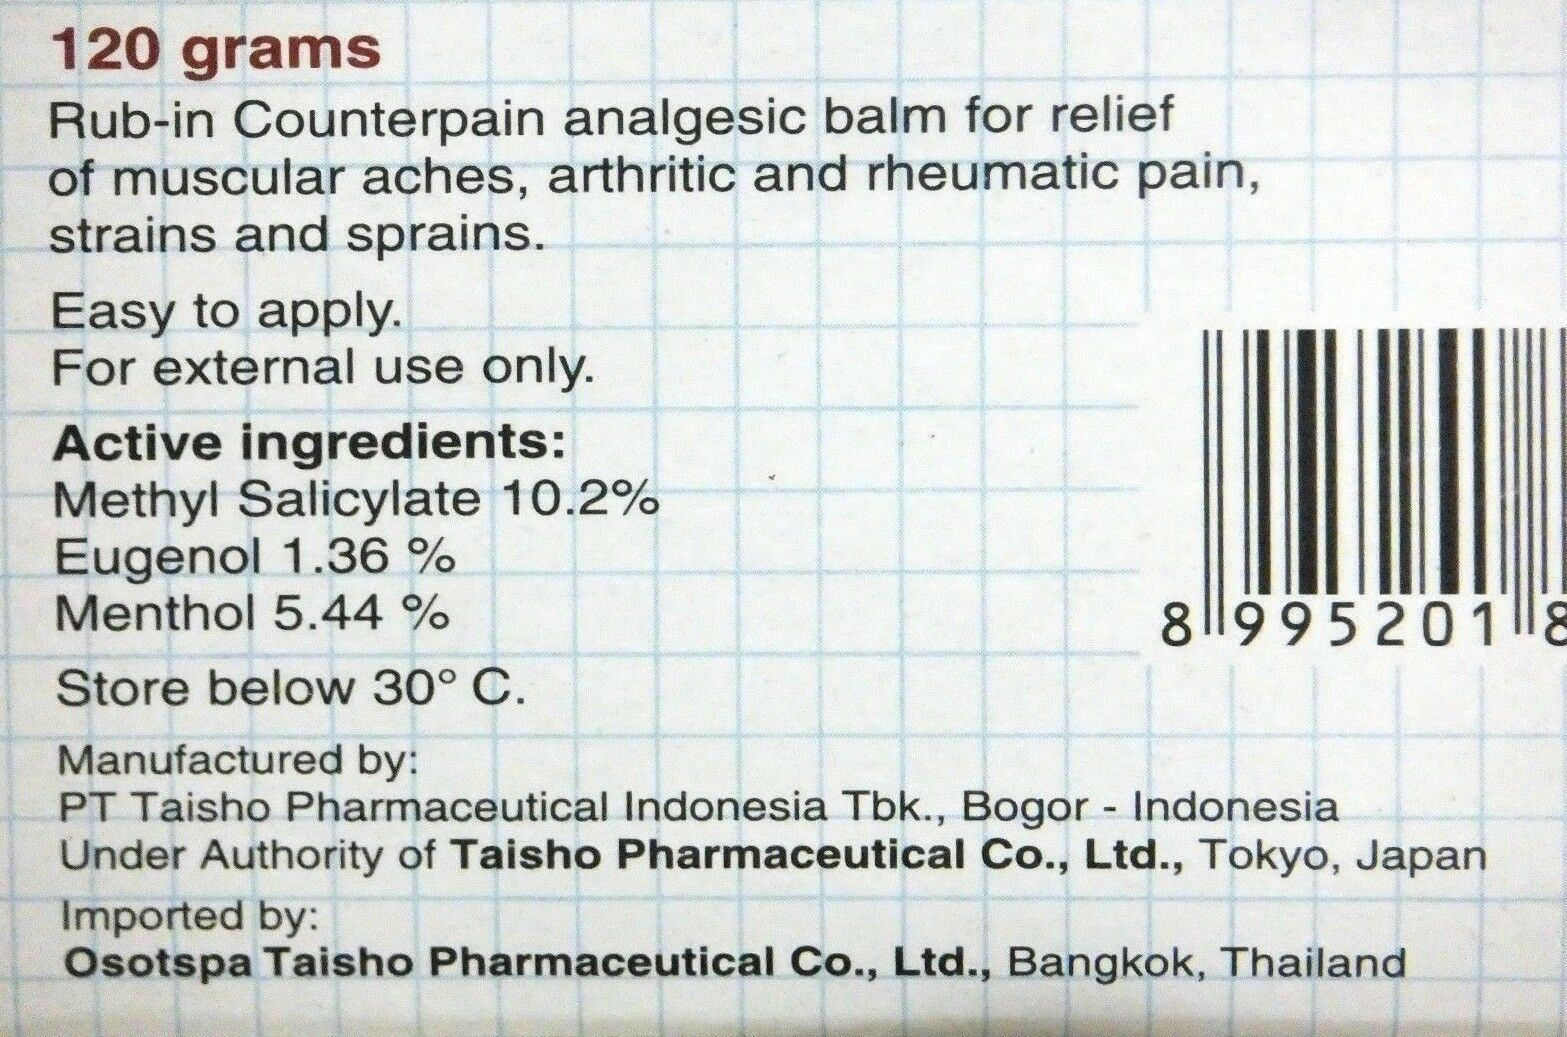 6x Counterpain 120g Analgesic Balm Massage Relieves Muscular Ache Pain Ebay